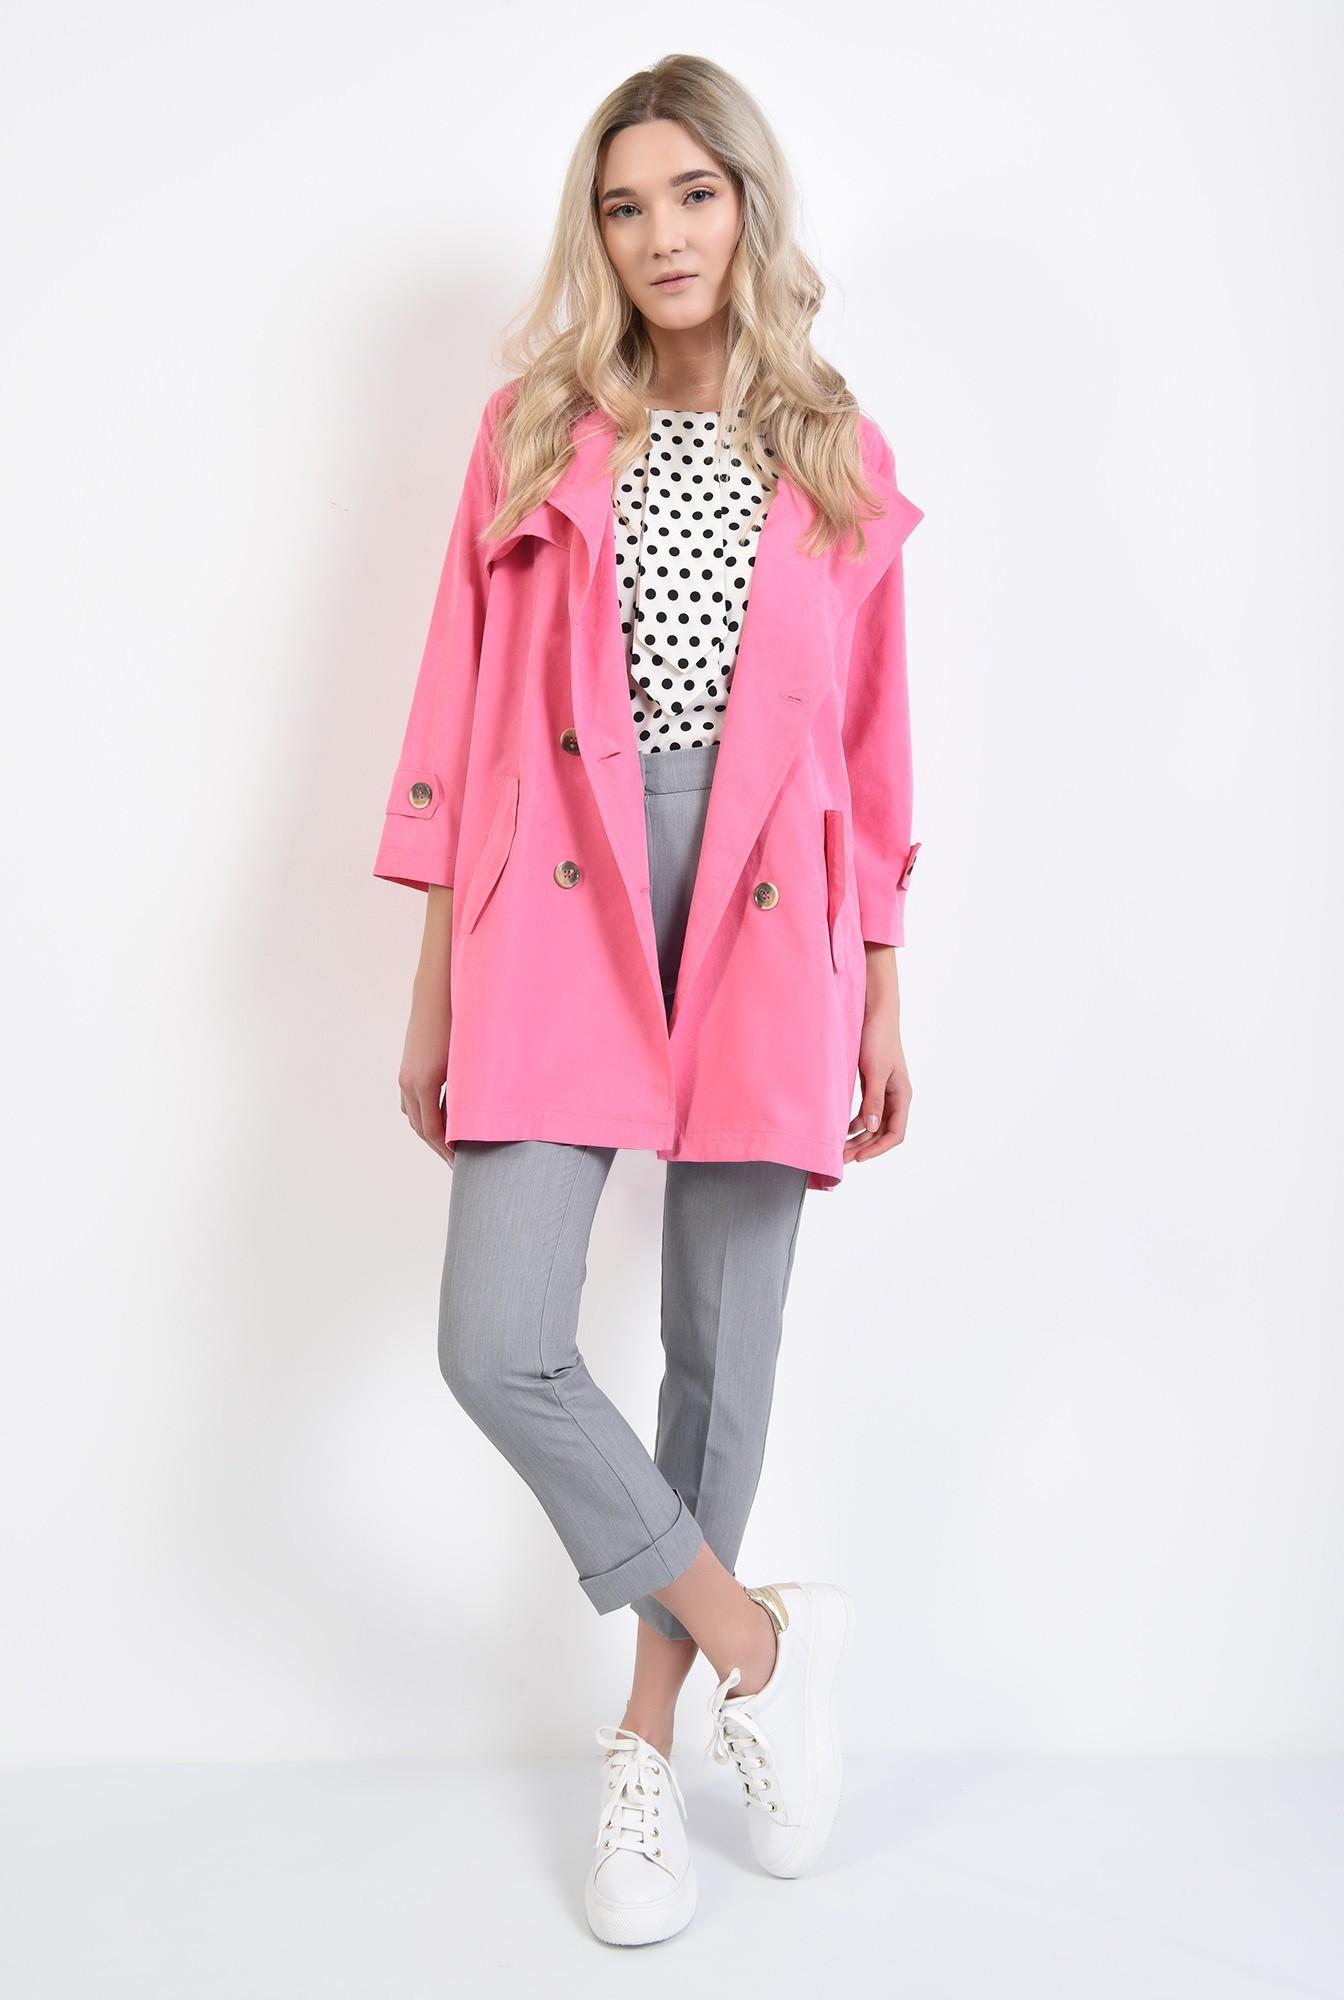 3 - jacheta roz, cu nasturi, cu revere, croi relaxat